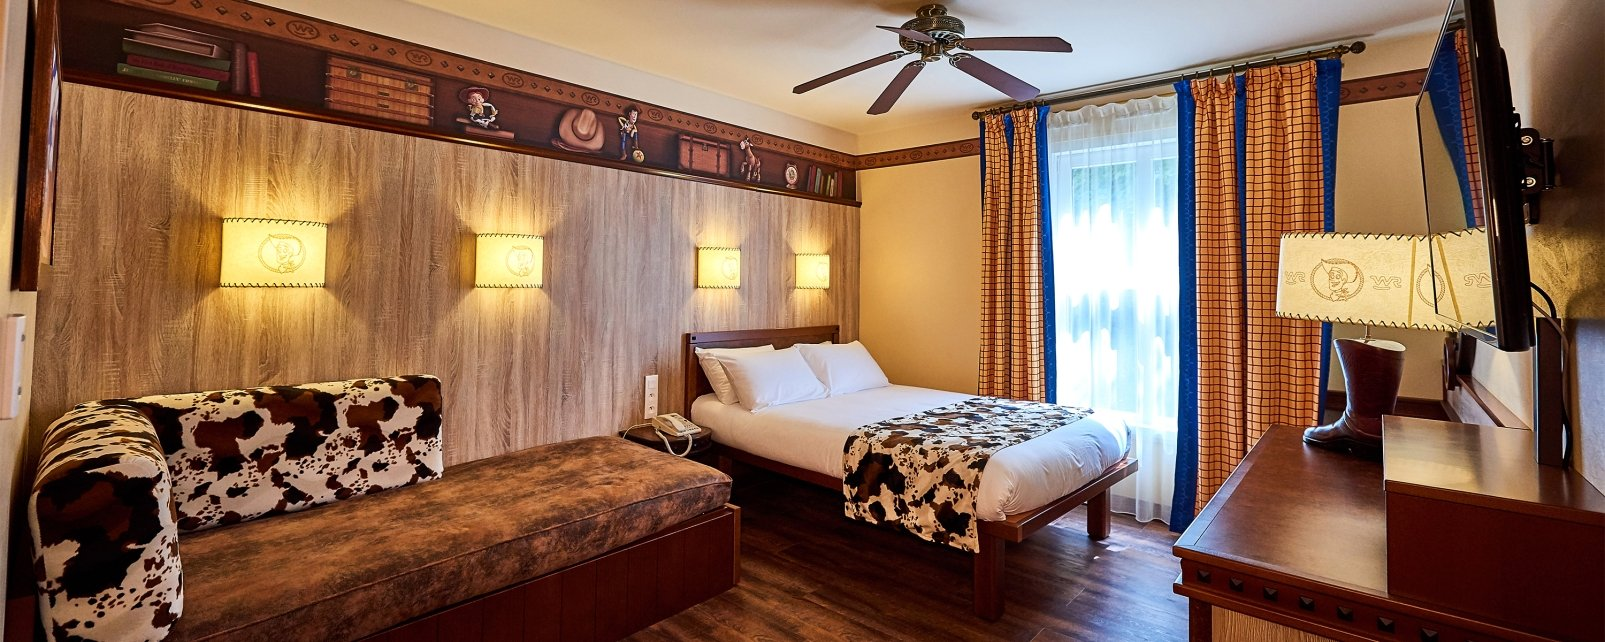 Hotel Disney 39 S Cheyenne In Marne La Vall E France